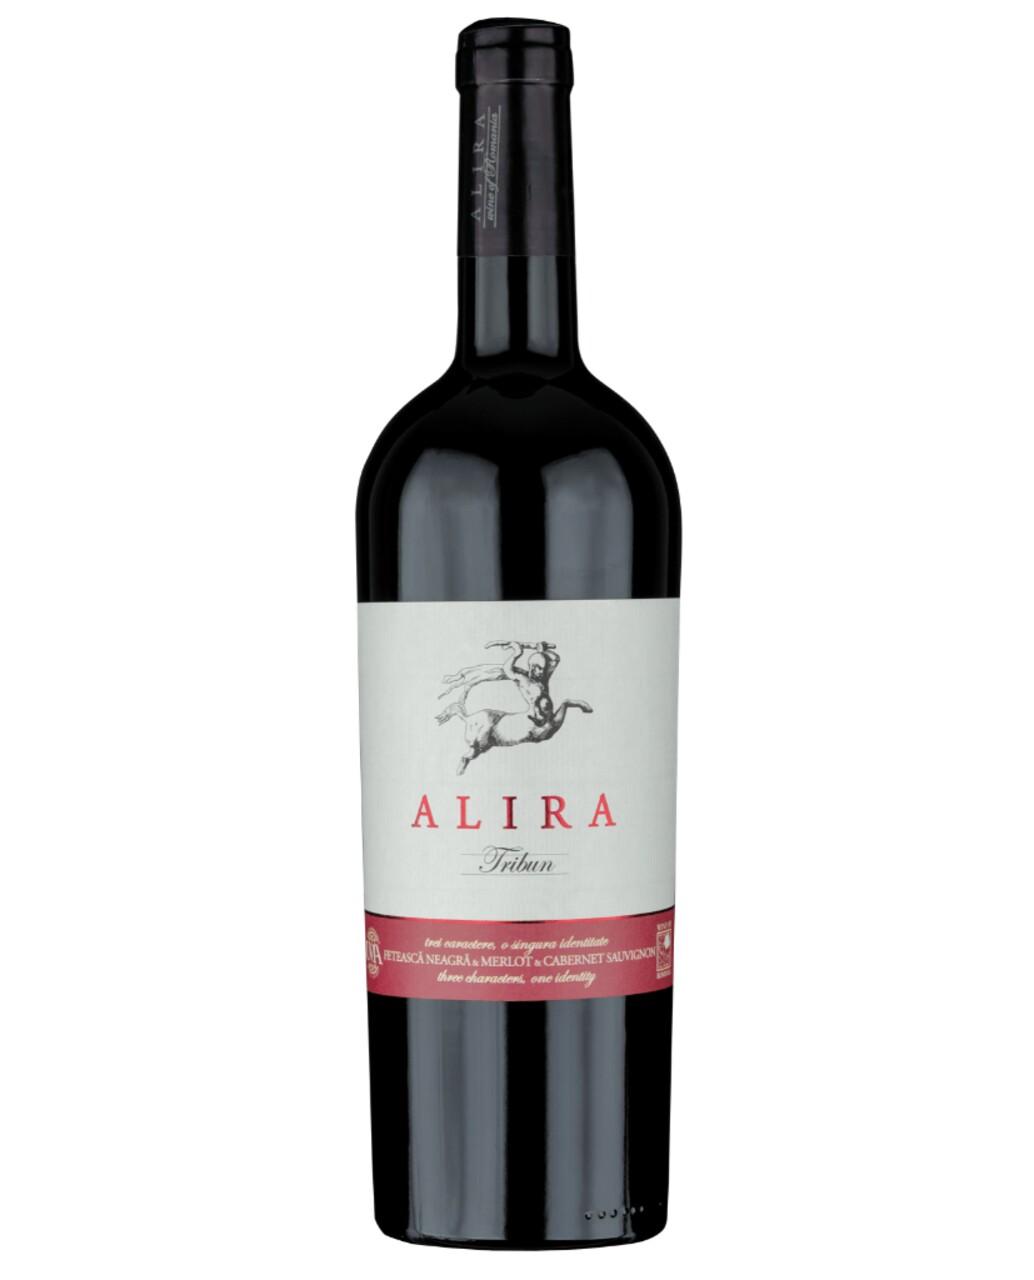 Alira Tribun